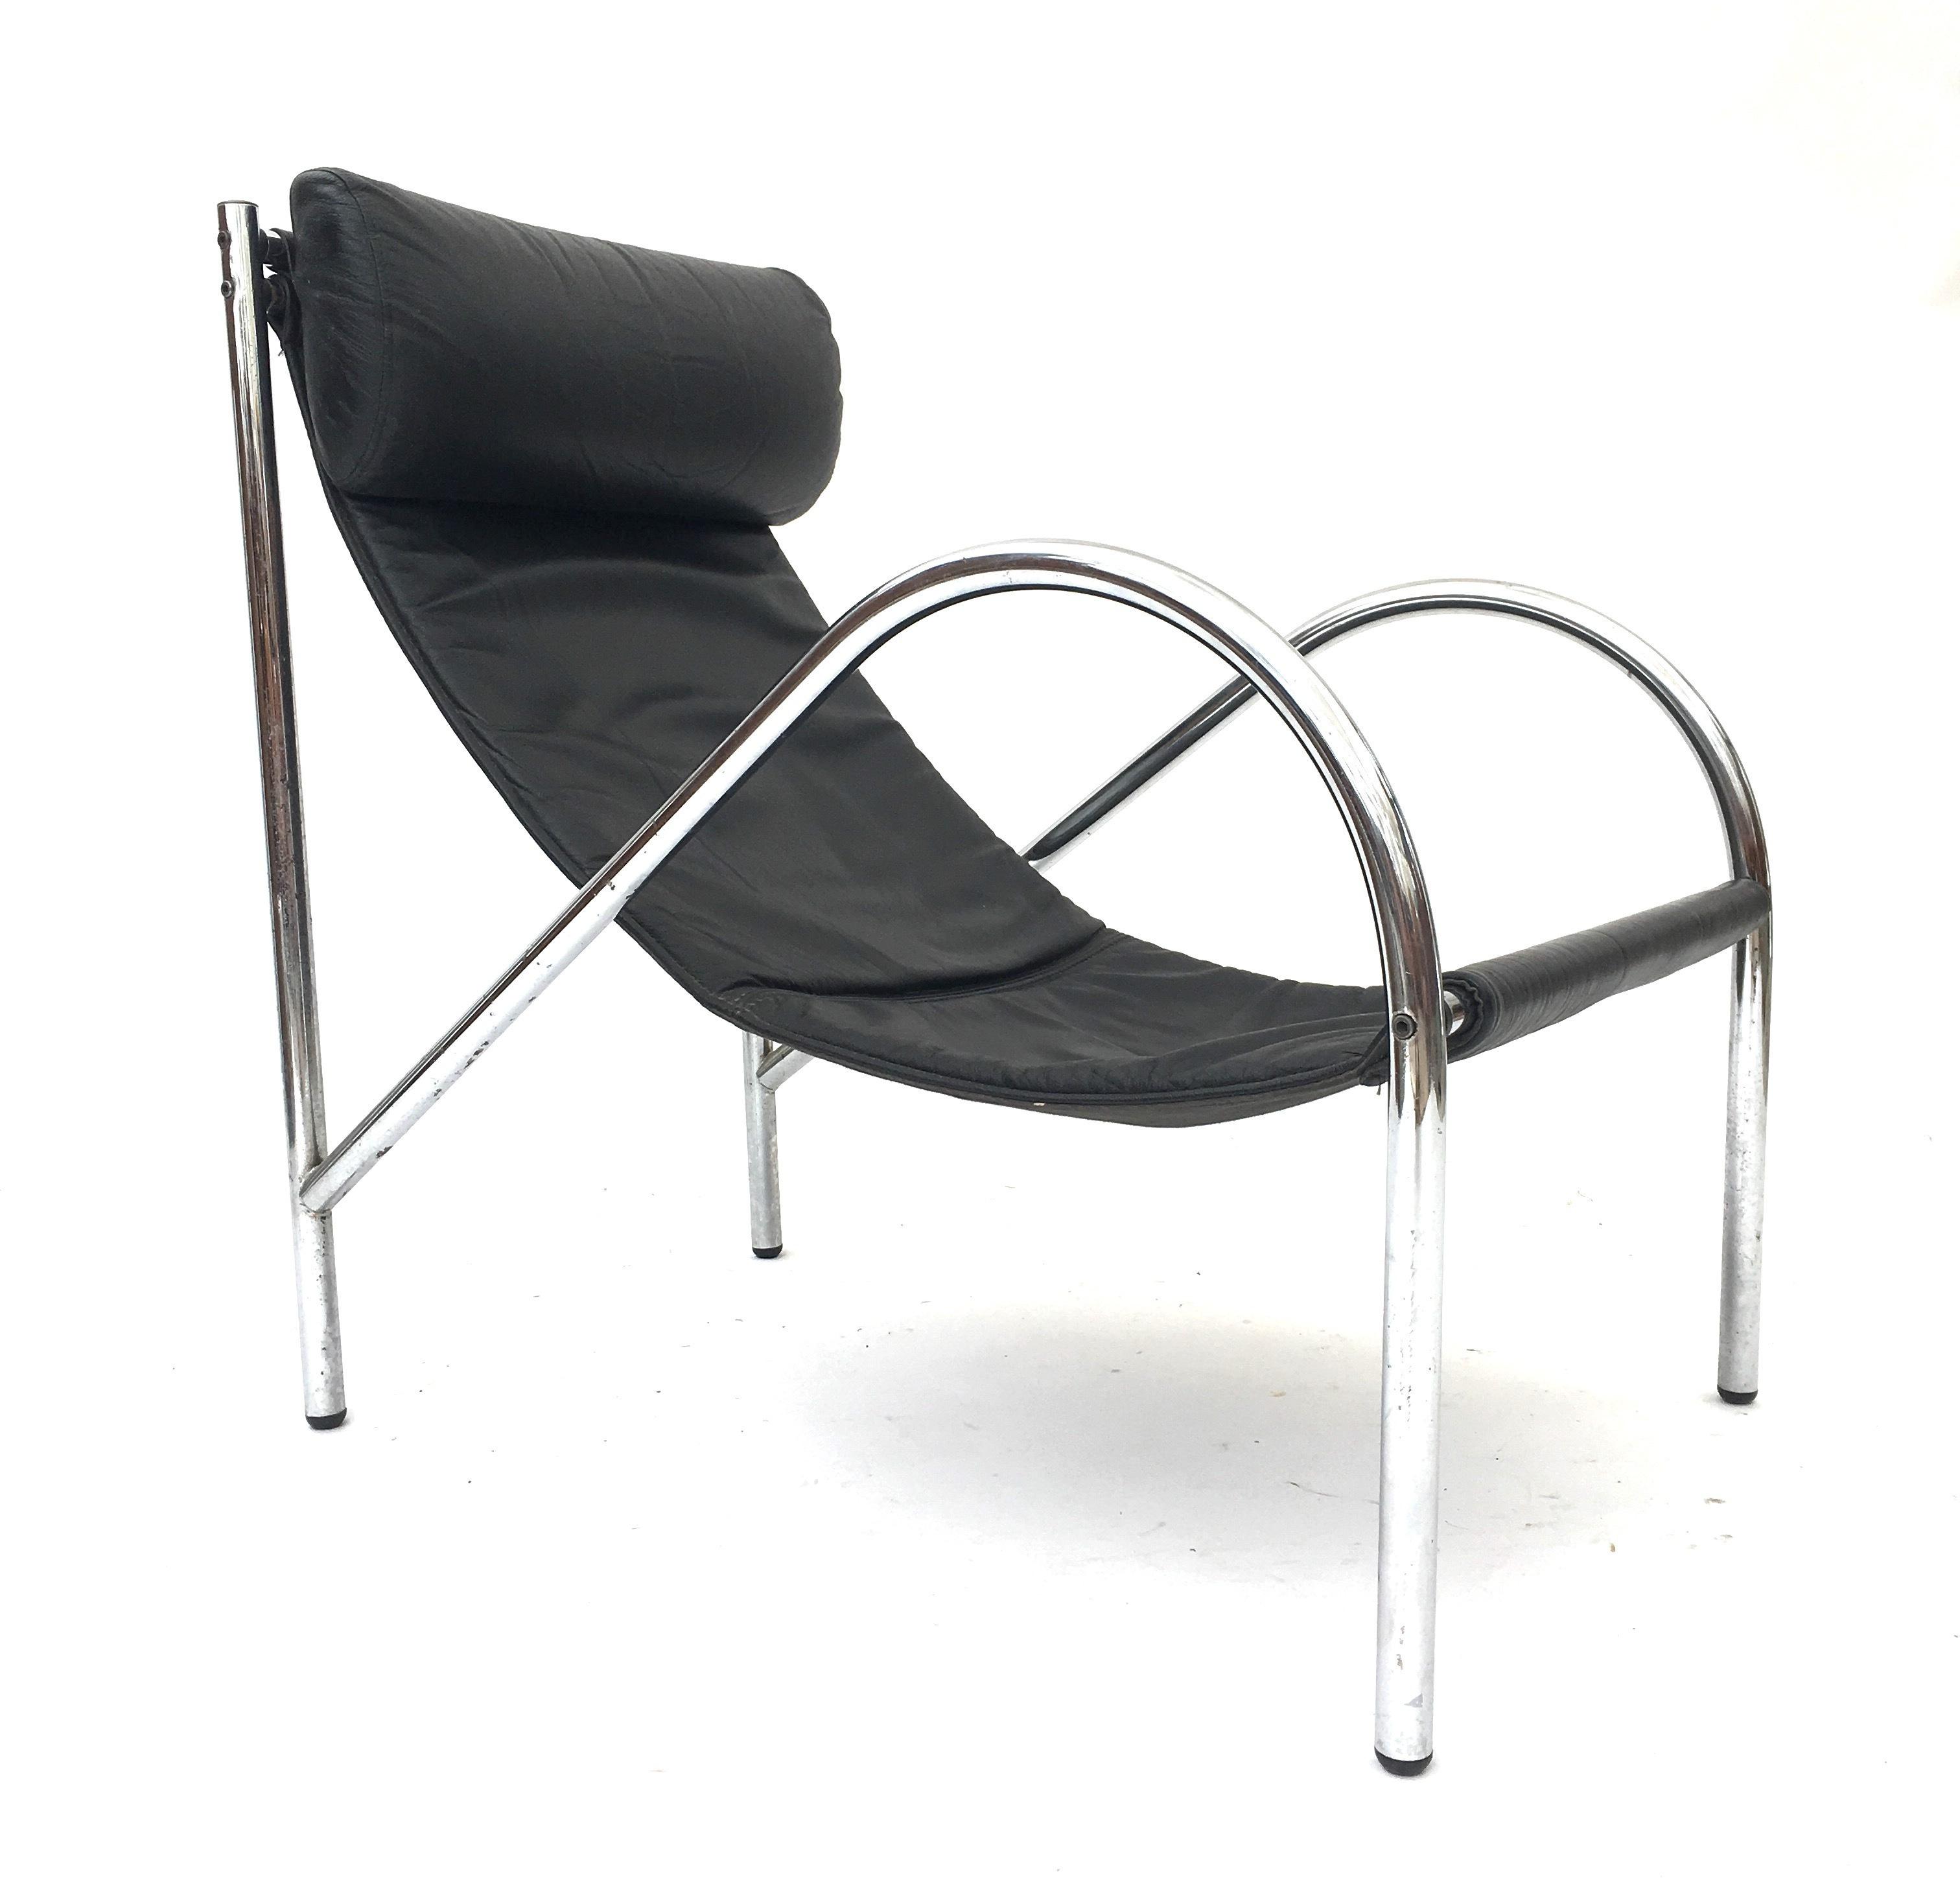 Vintage Retro Mid Century 1970s Chrome Leather Danish Era Modernist Sling Chair